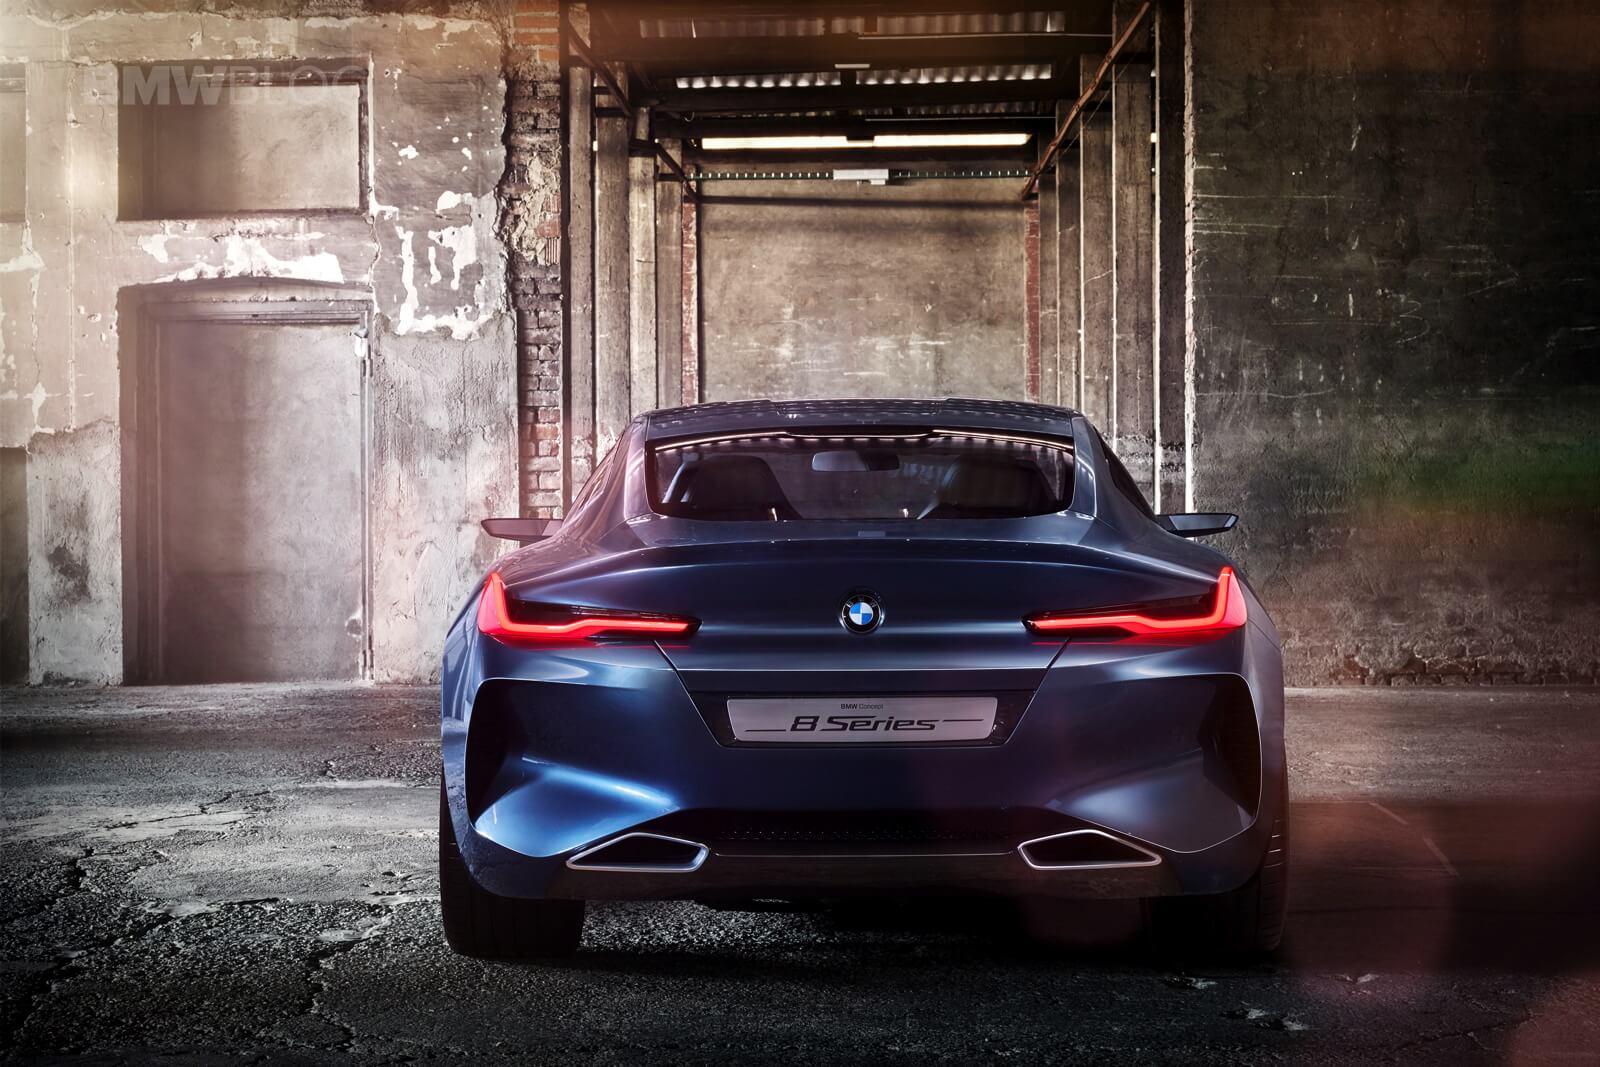 Презентация BMW 8 на гоночной трассе в Ле-Мане